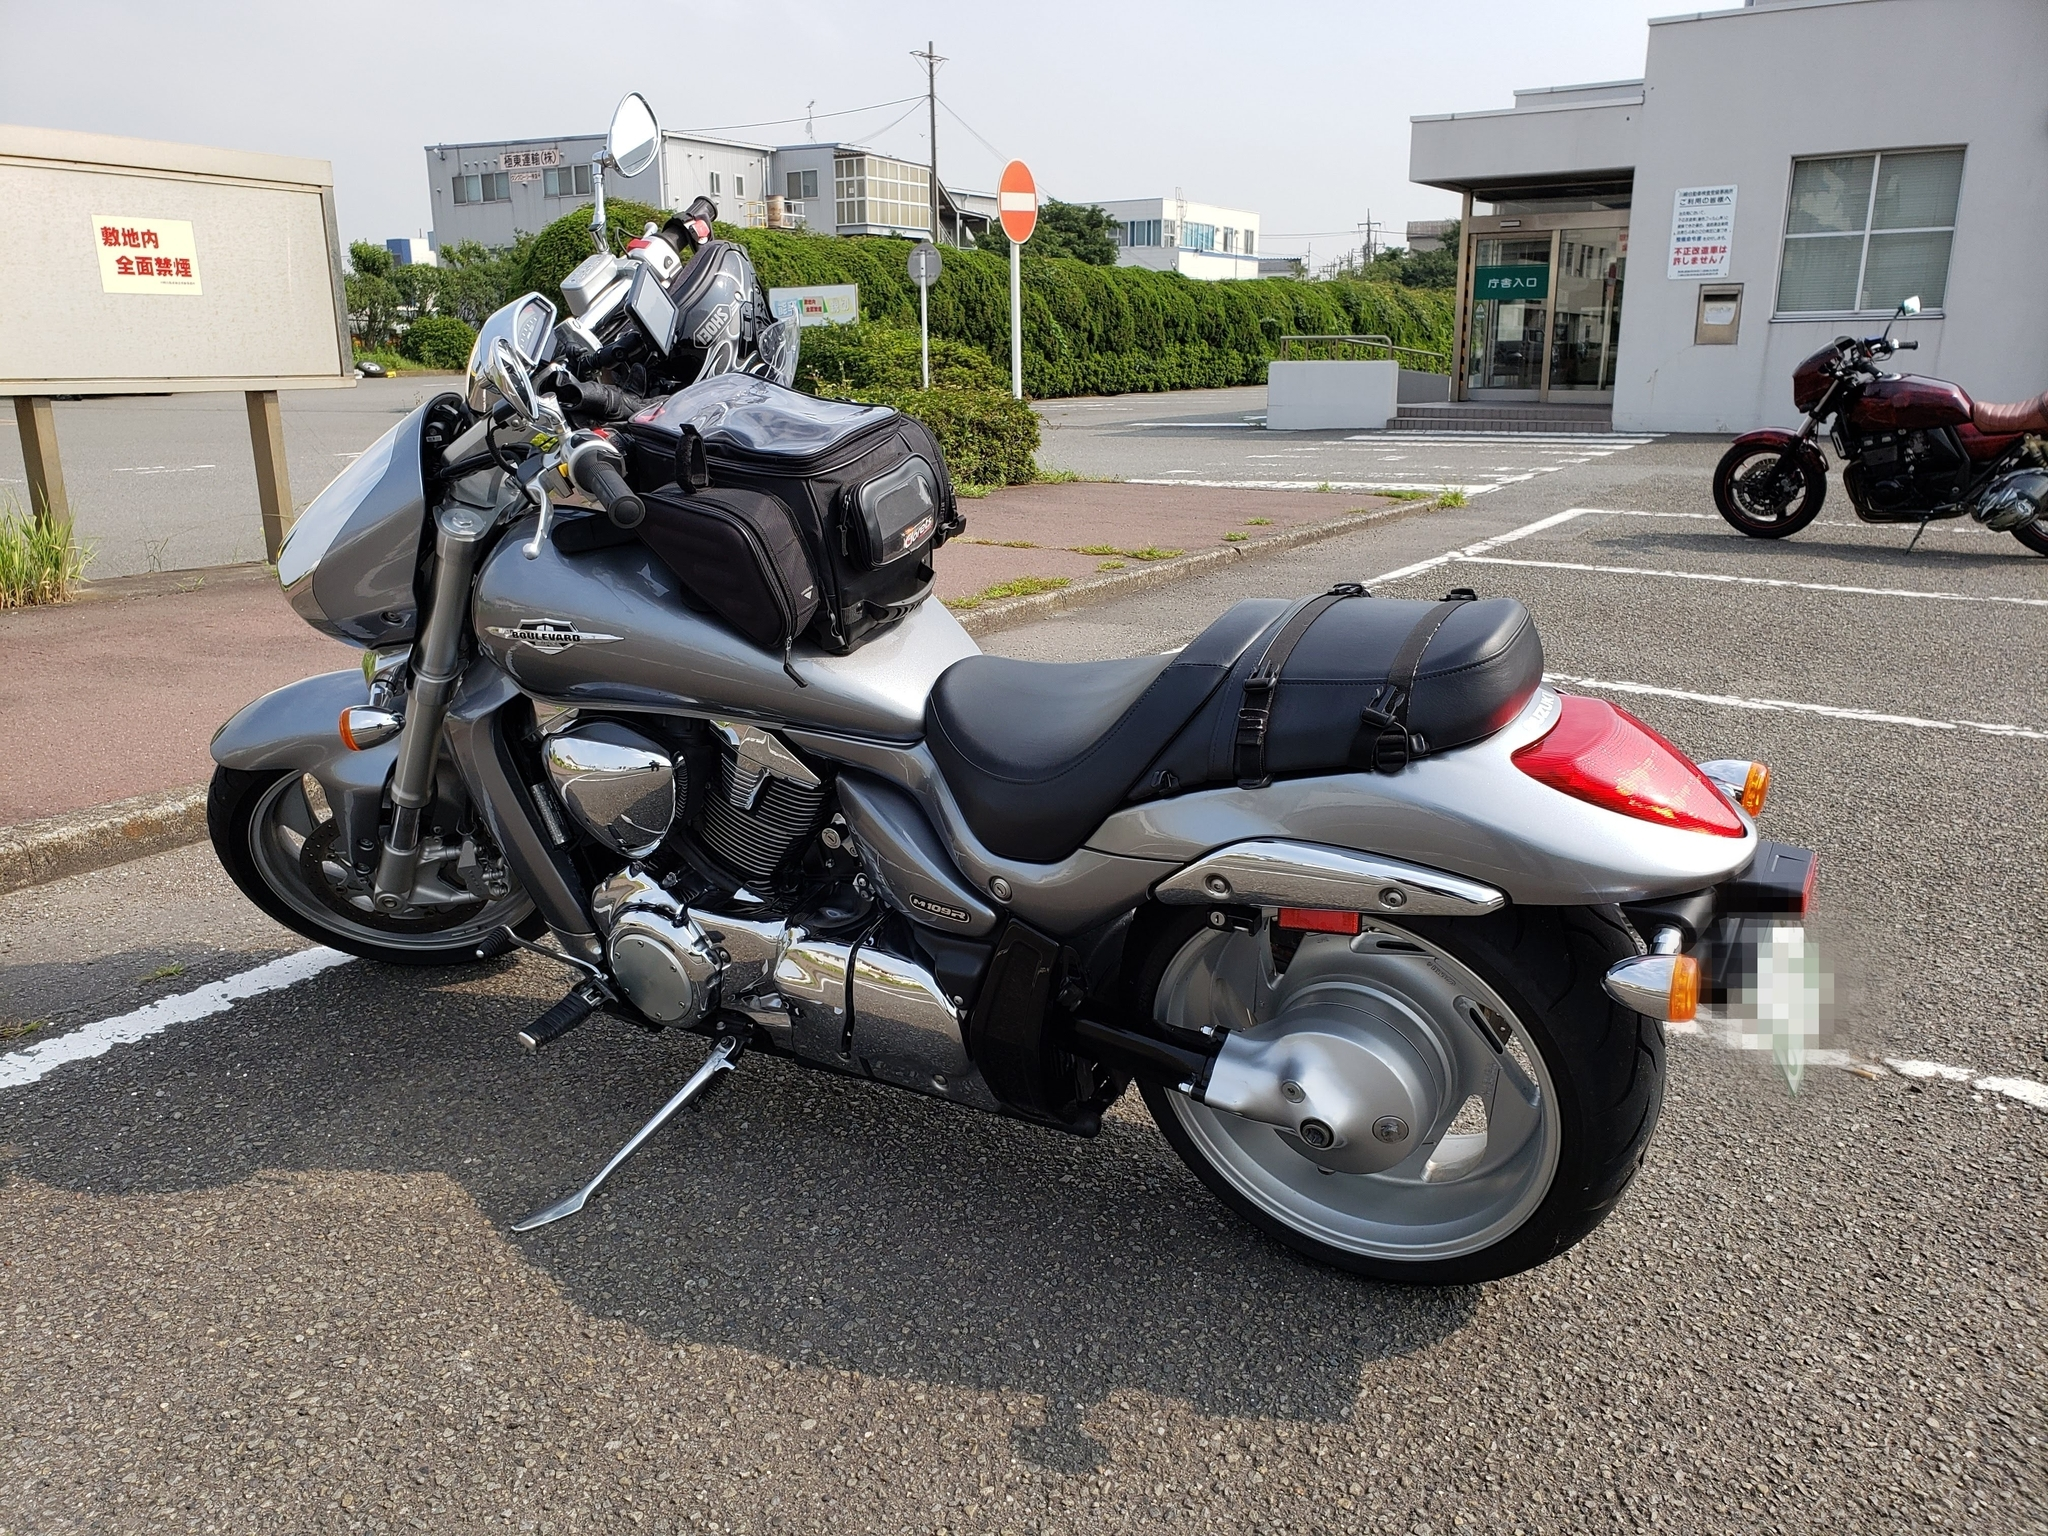 f:id:ToshUeno:20190802083400j:plain